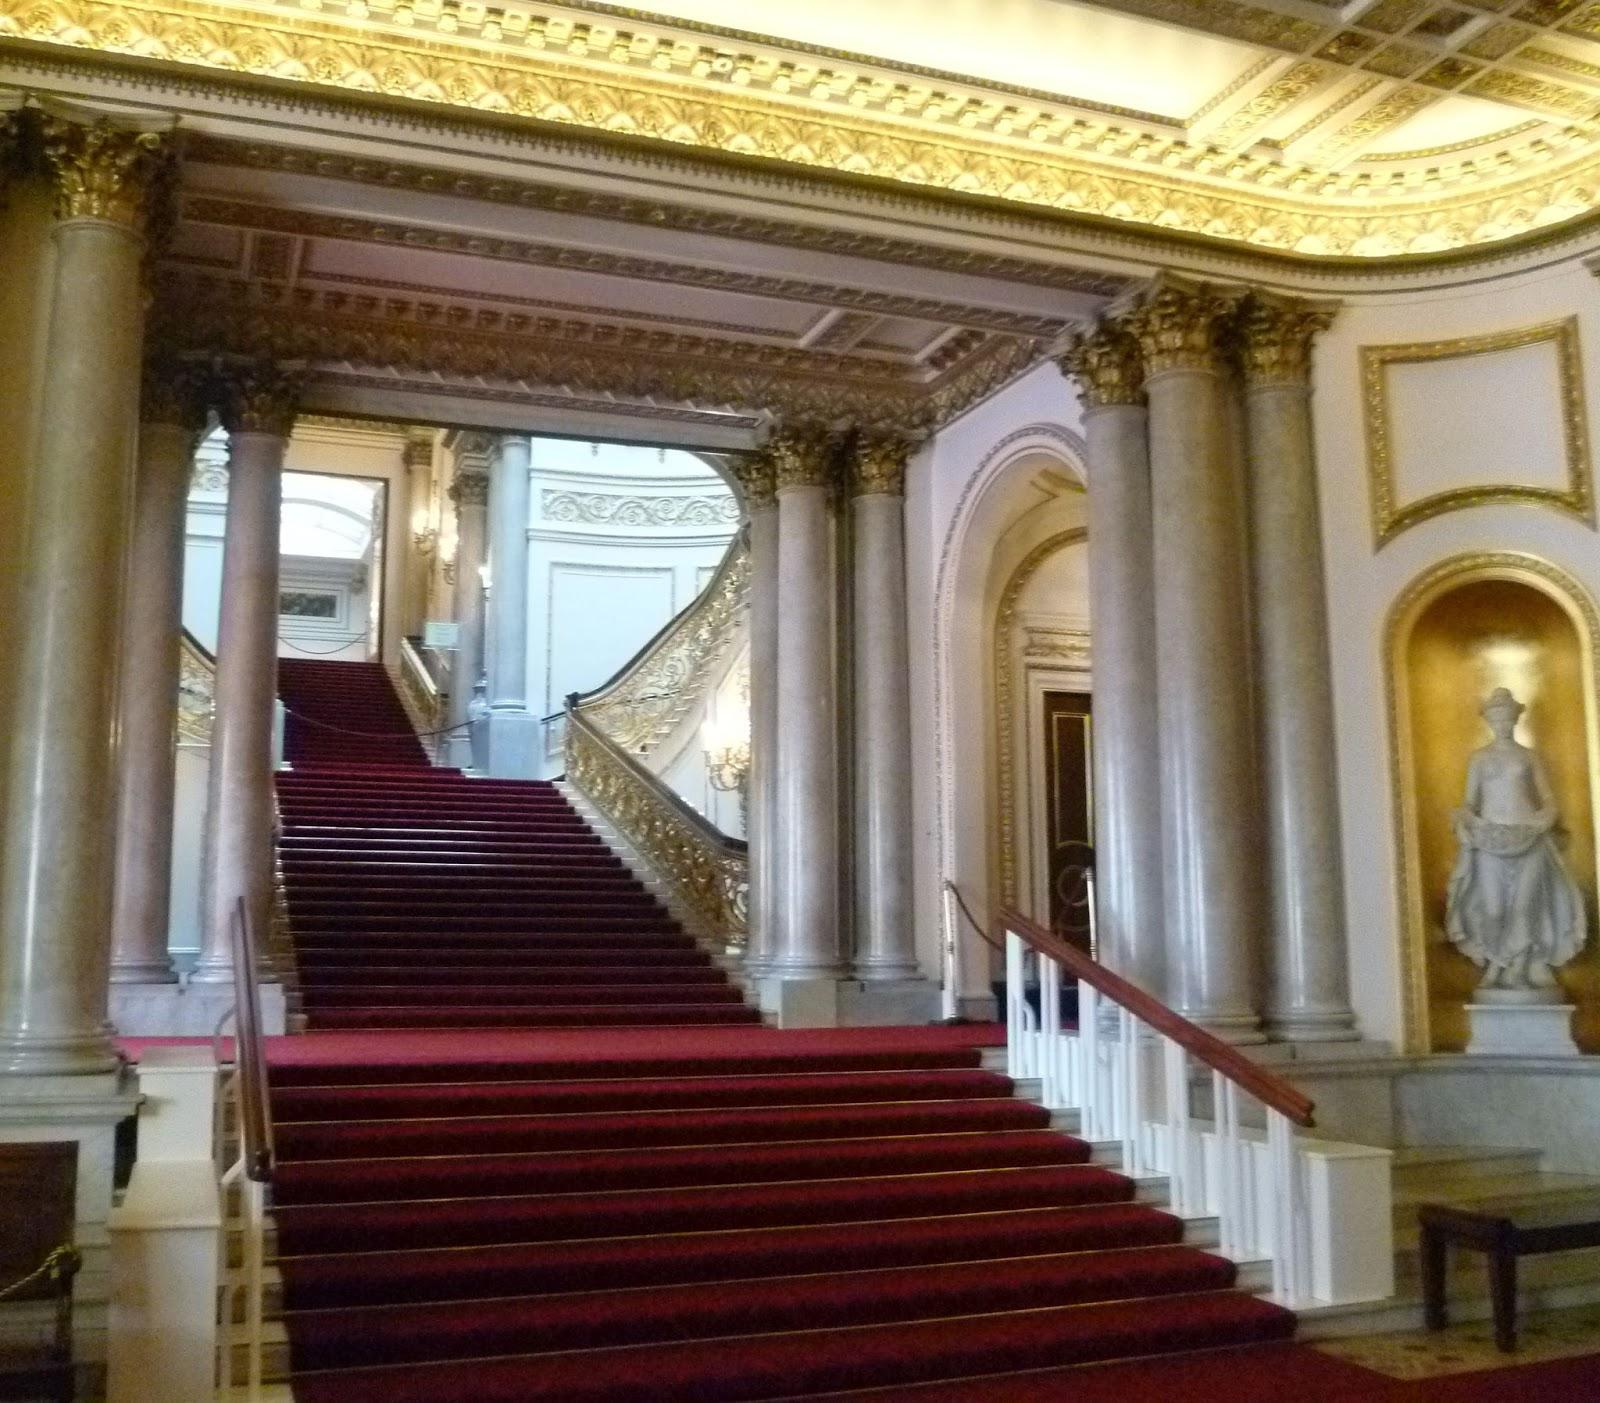 Historical and Regency Romance UK: BUCKINGHAM PALACE  A